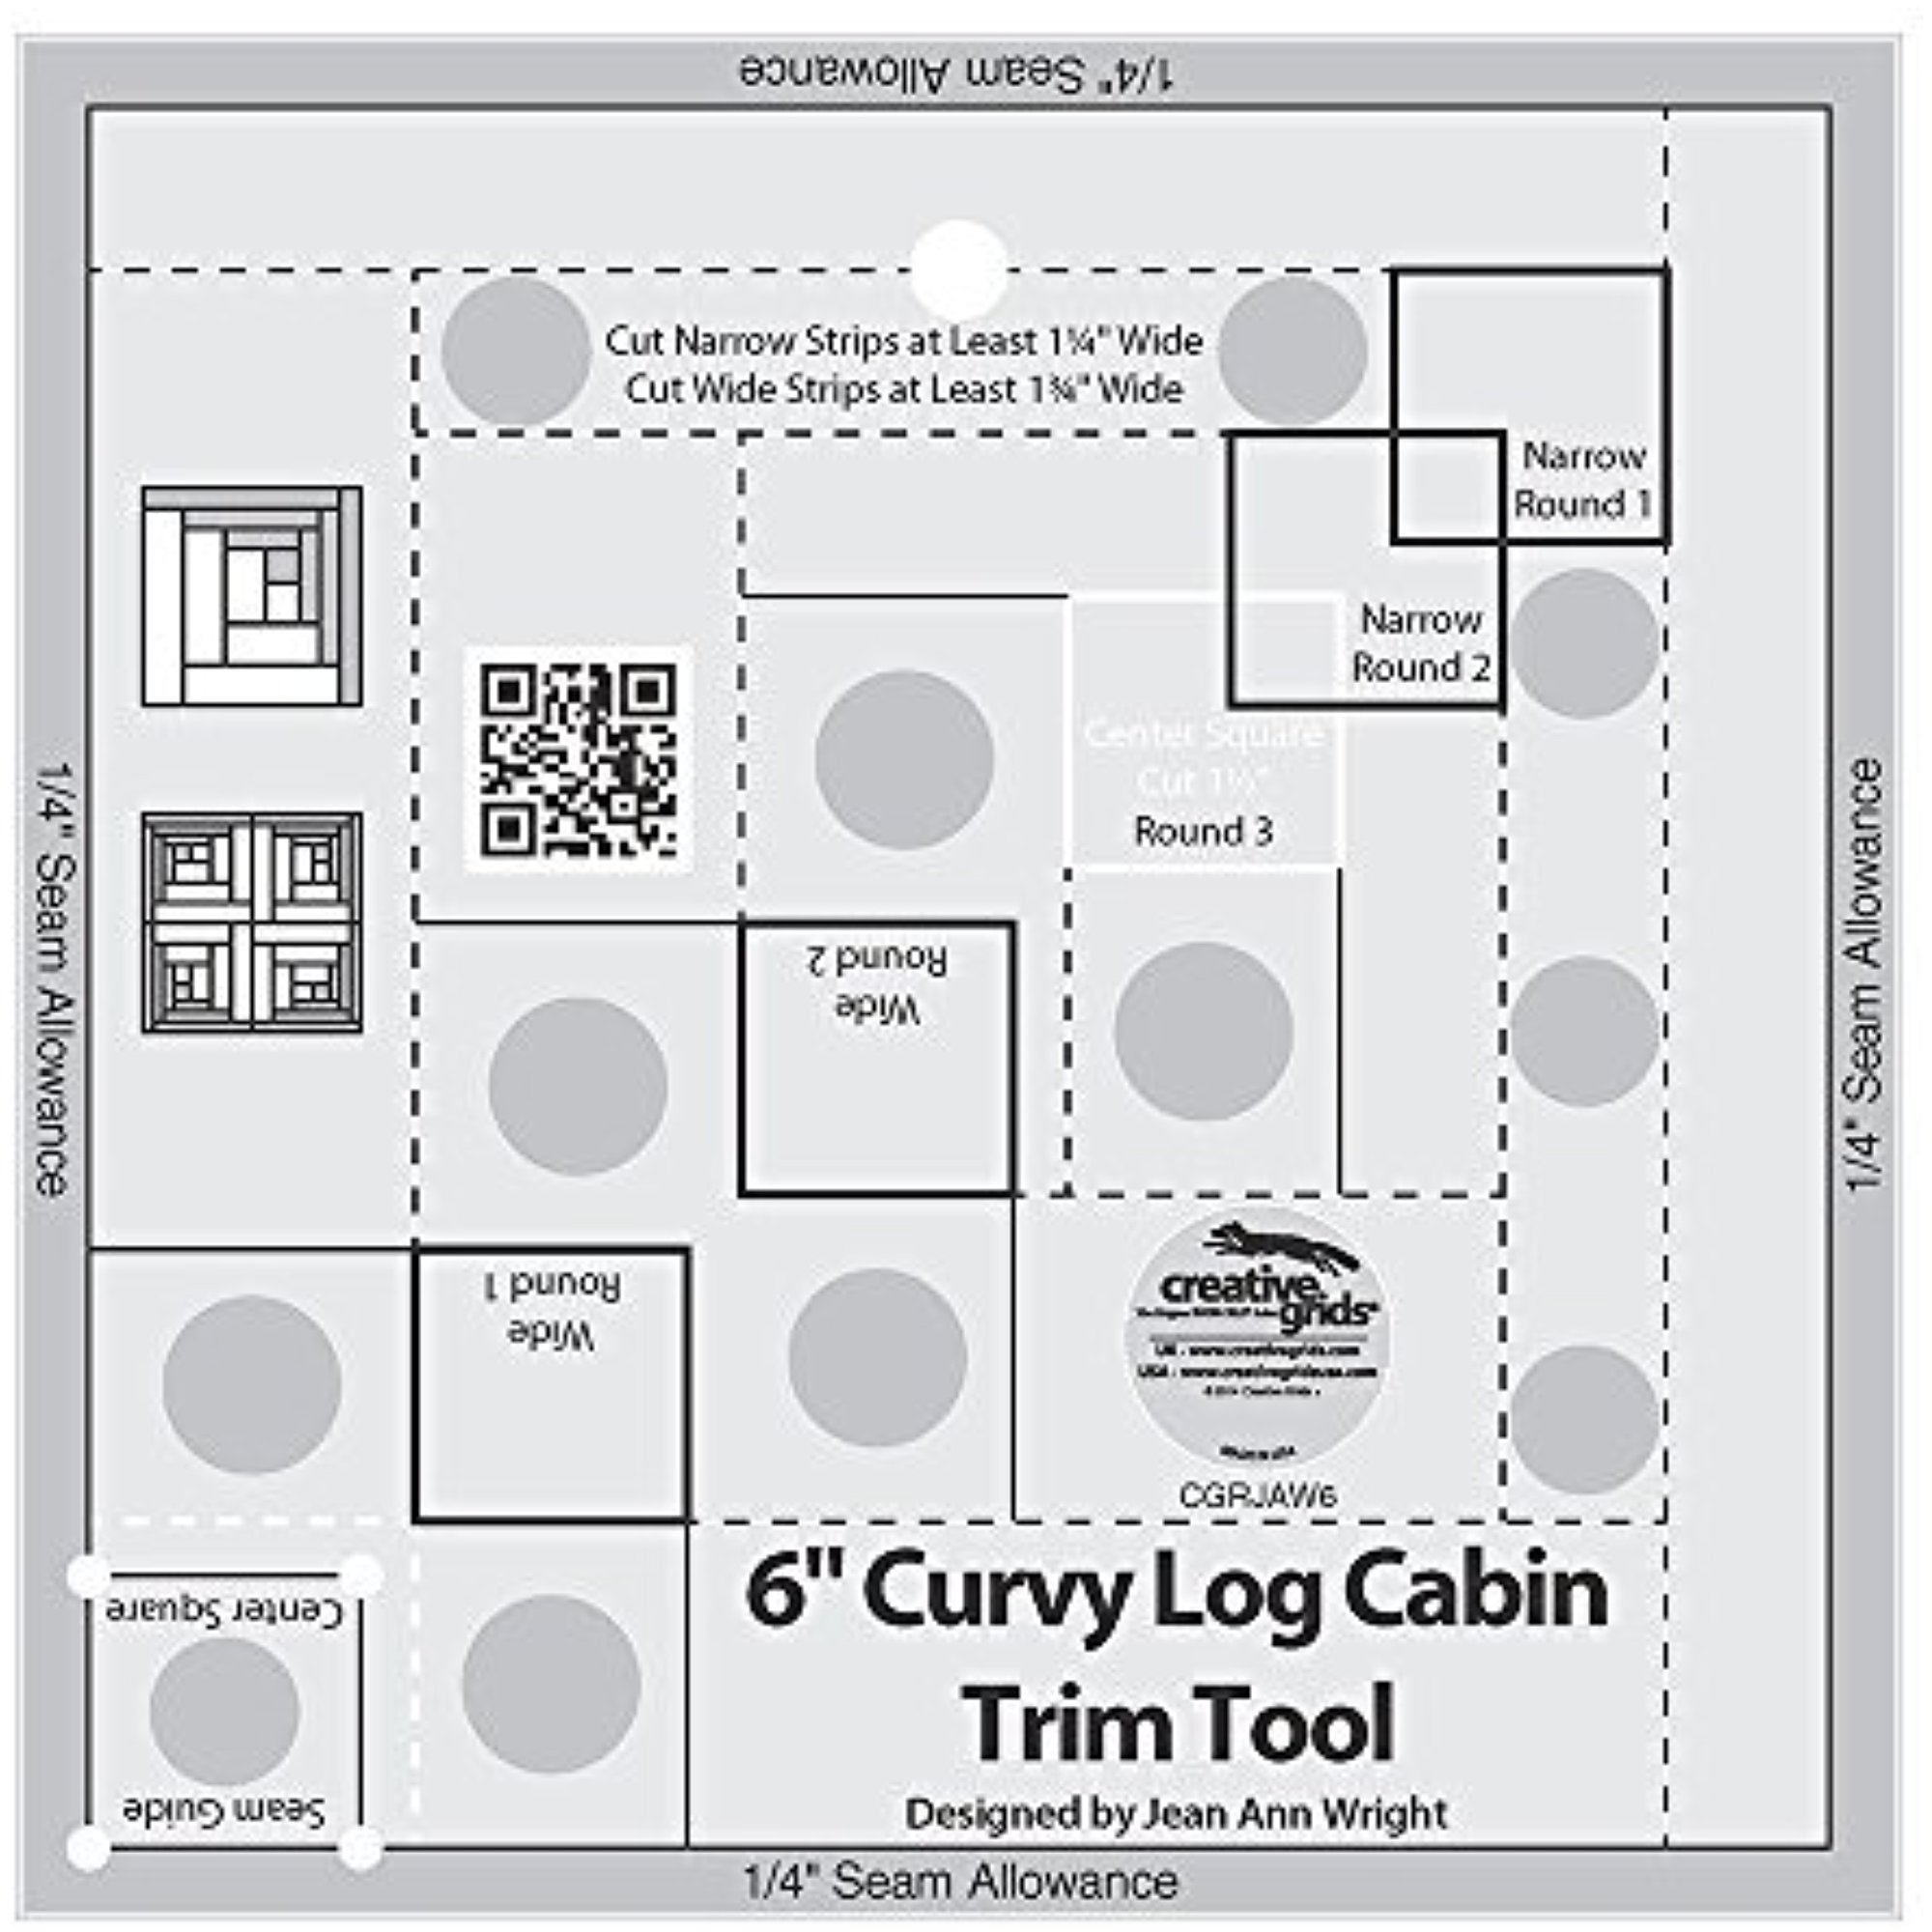 Creative Grids Curvy Log Cabin Trim Tool for 6 Finished Blocks Ruler